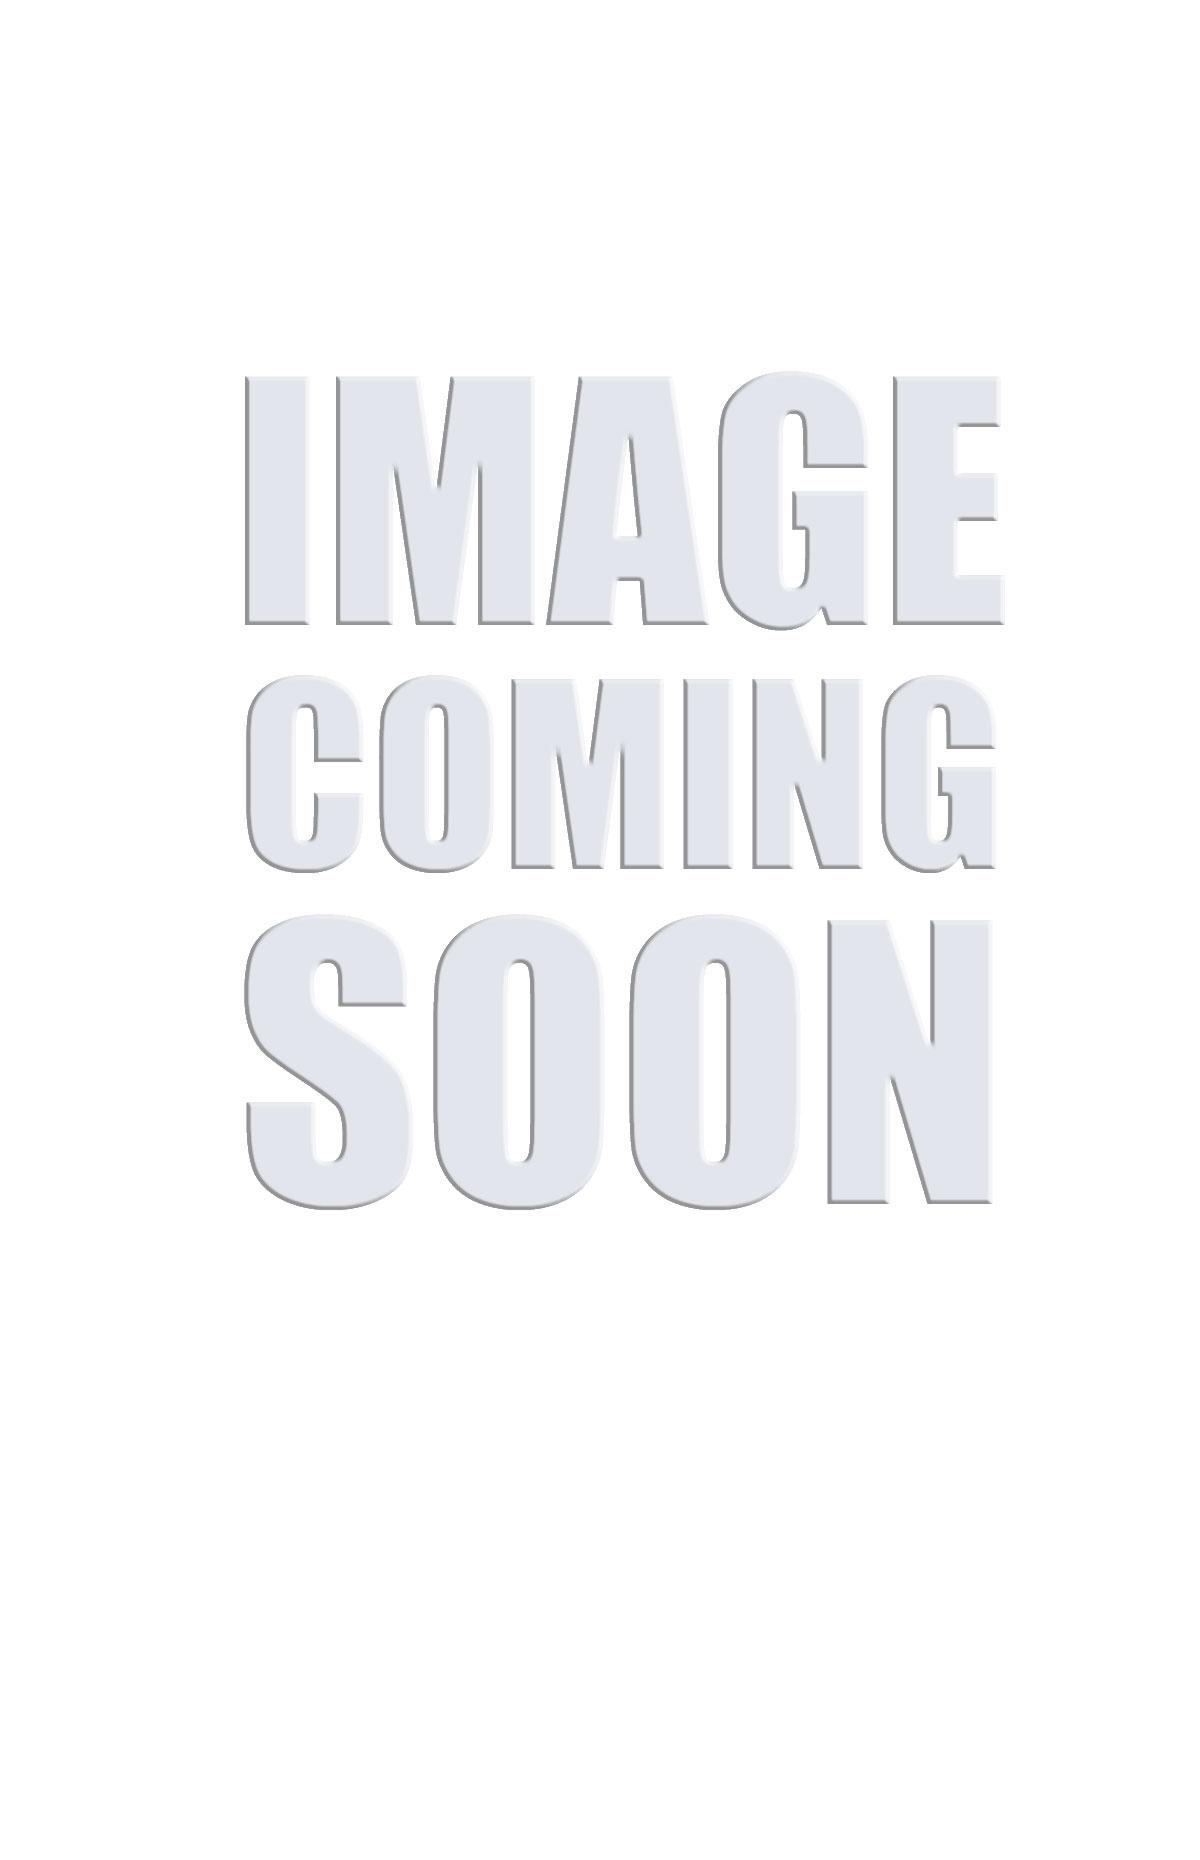 Tangential Discharge Vacuum Motor - Lamb #115937-00, BPT, HD, B/B, A/S, 2 STG